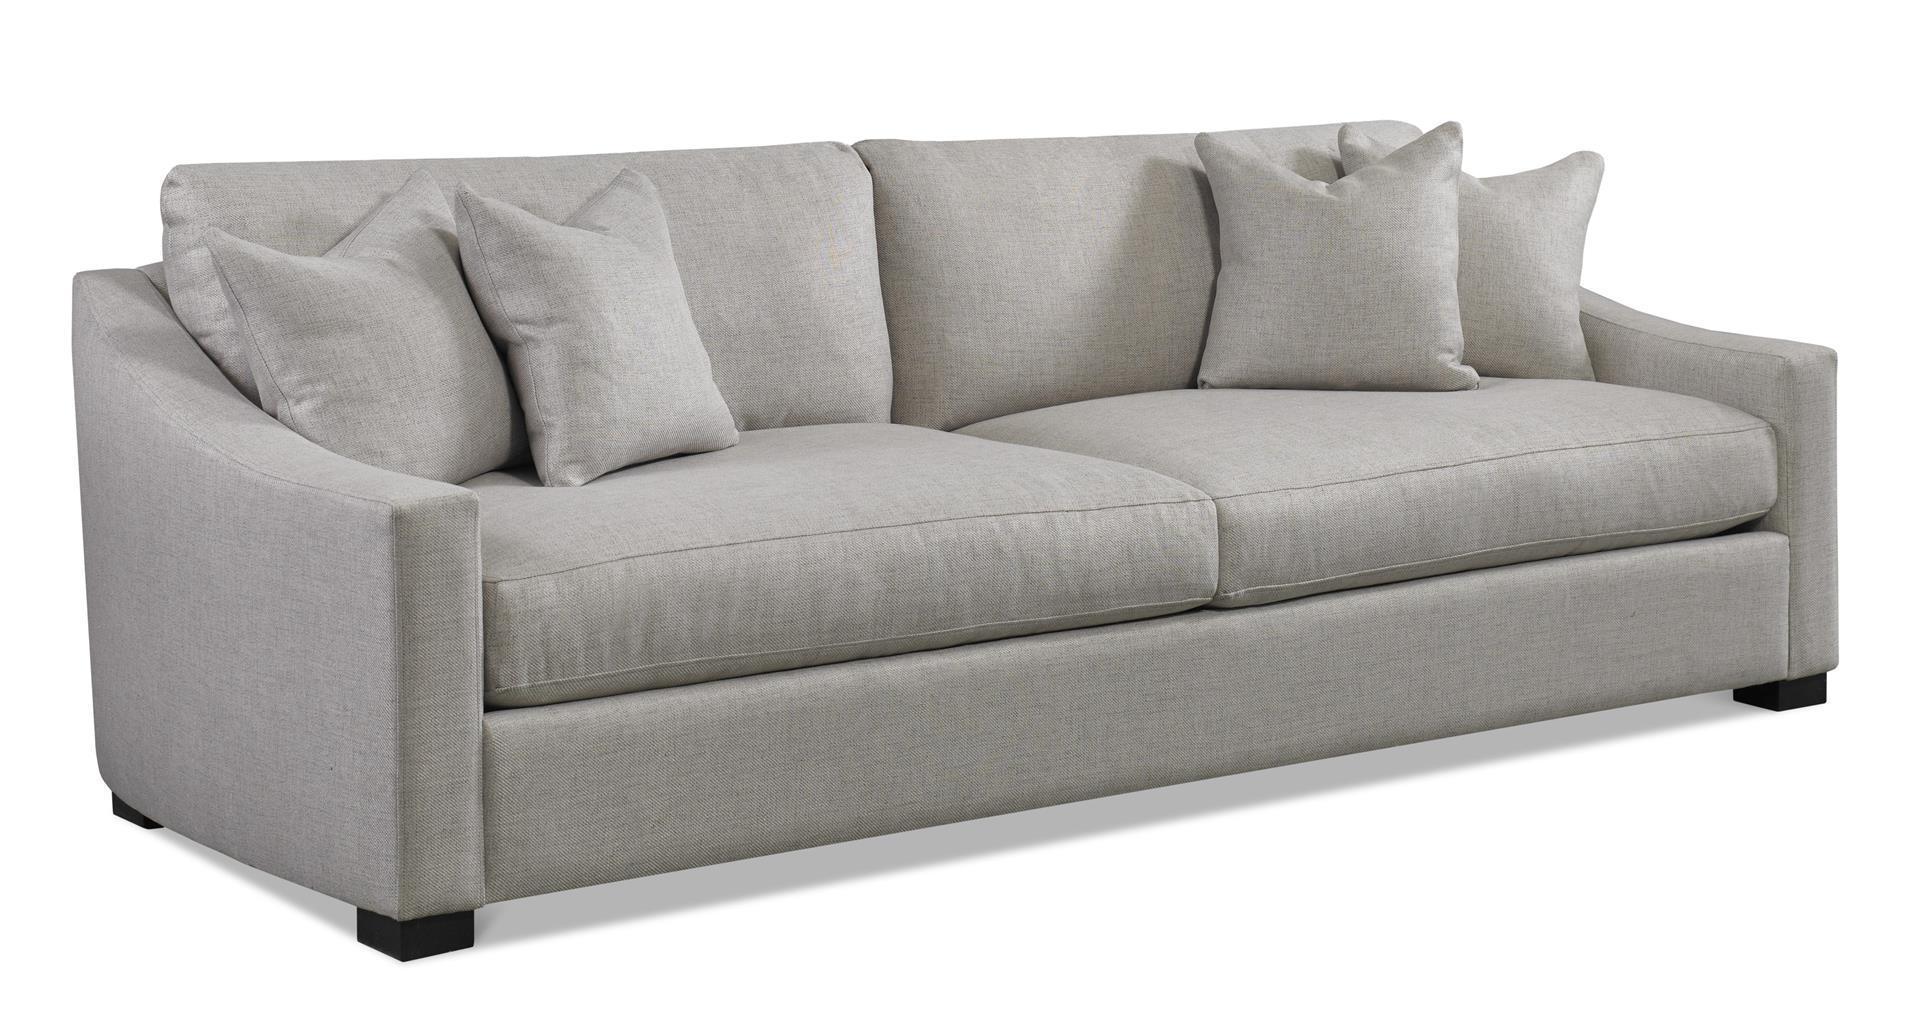 Wondrous Hilton Sofa Machost Co Dining Chair Design Ideas Machostcouk